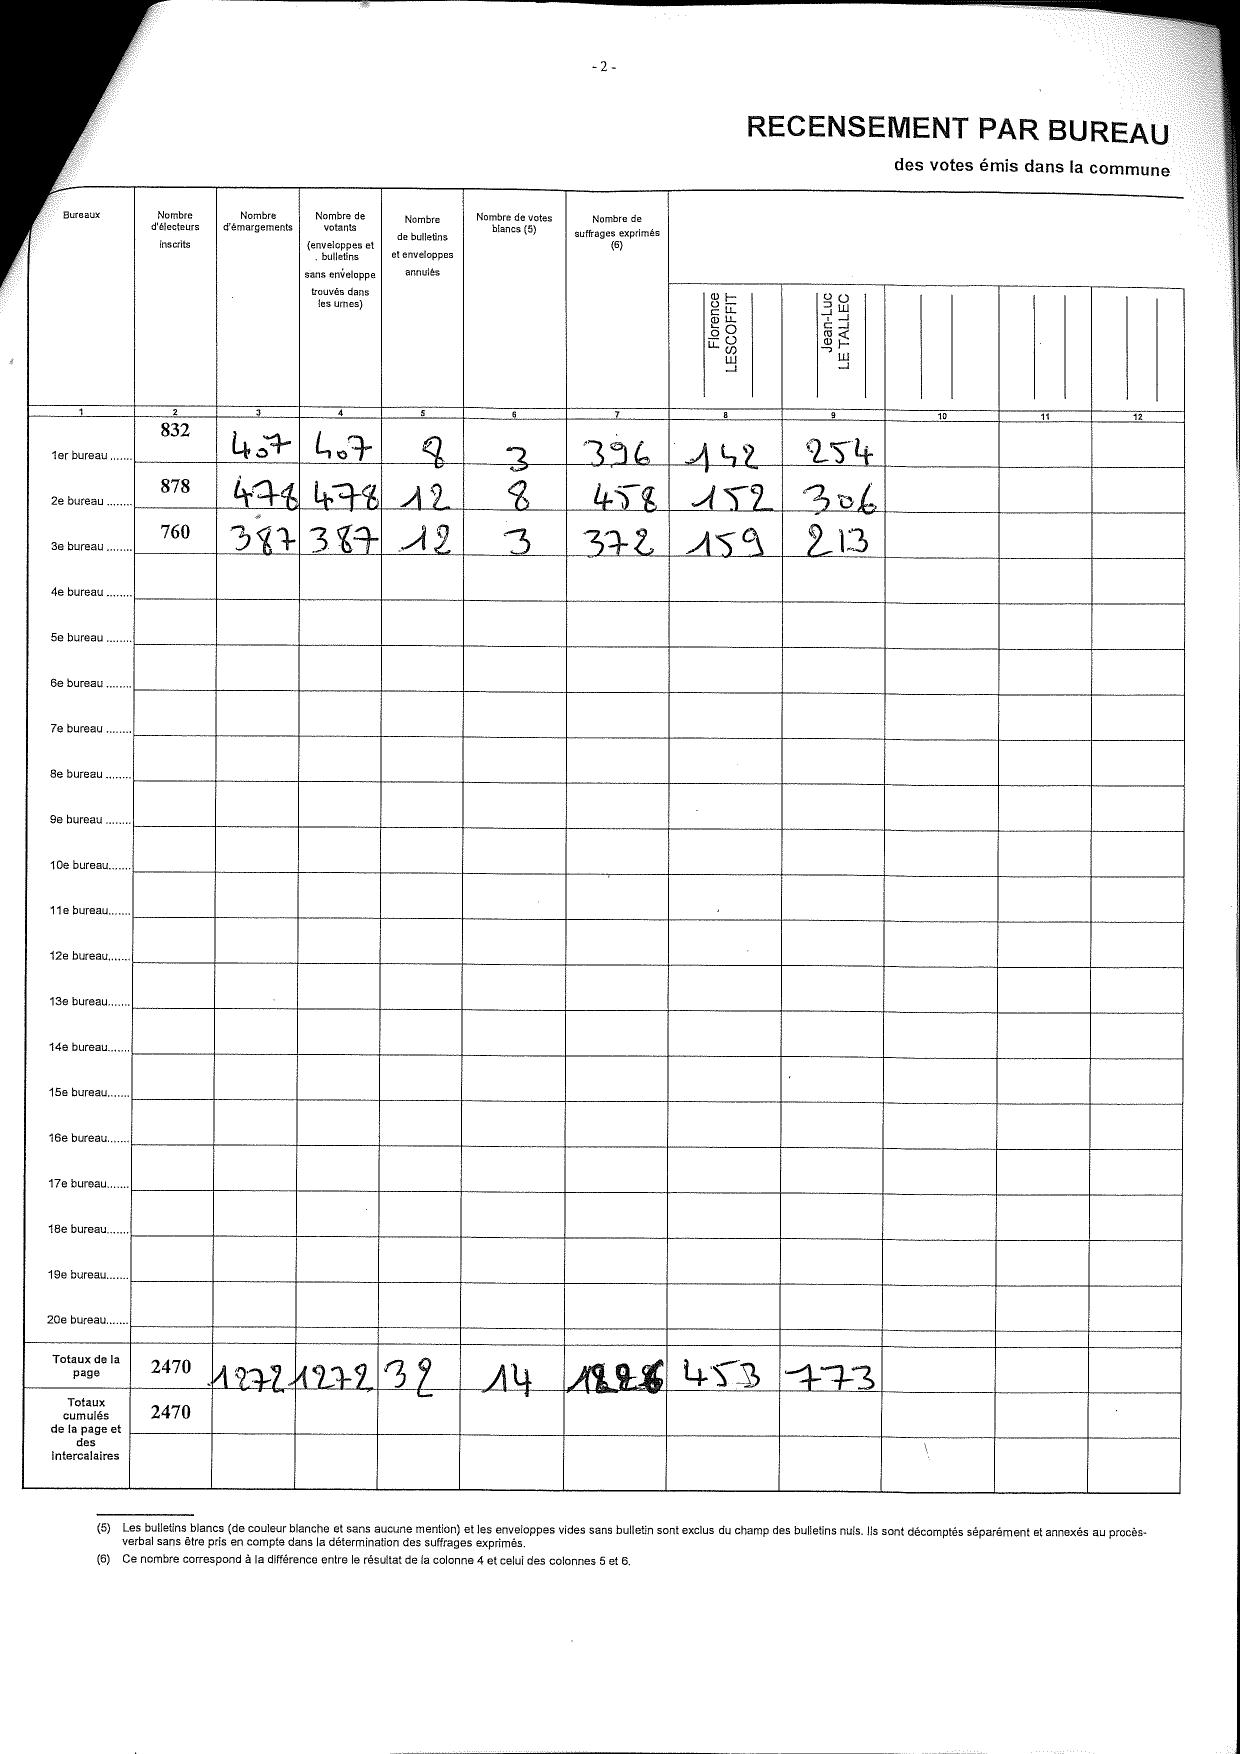 Résulats municipales mars 2020_pages-to-jpg-0001.jpg